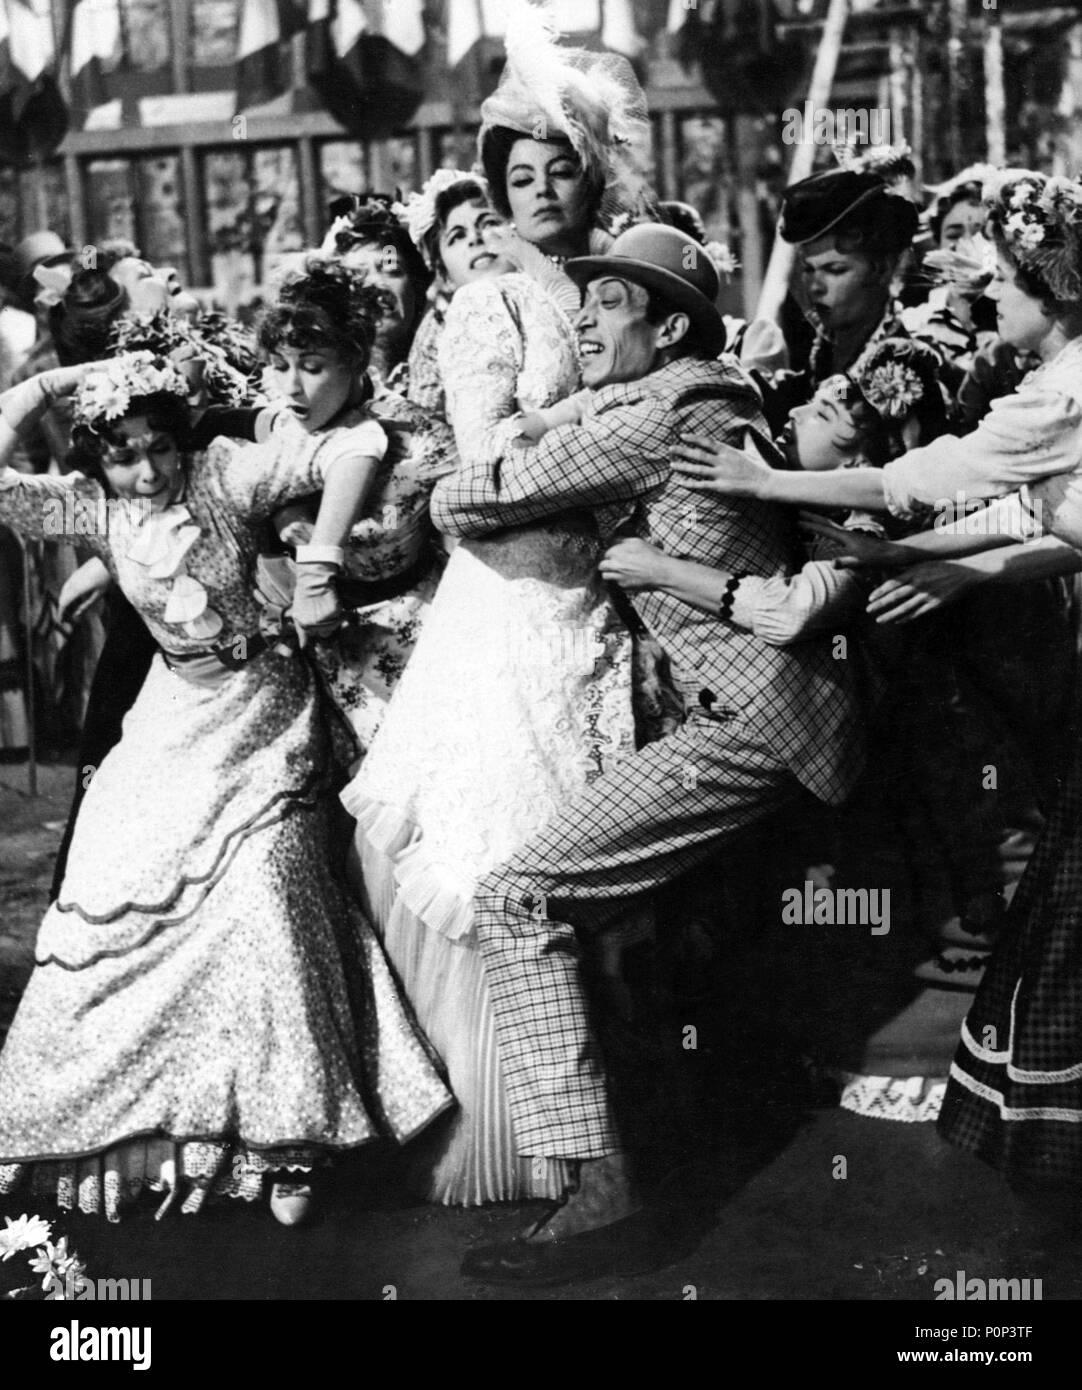 English Title: FRENCH CANCAN. Film Director: JEAN RENOIR. Year: 1954.  Stars: MARIA FELIX; PHILIPPE CLAY. Credit: FRANCO LONDON FILMS / Album